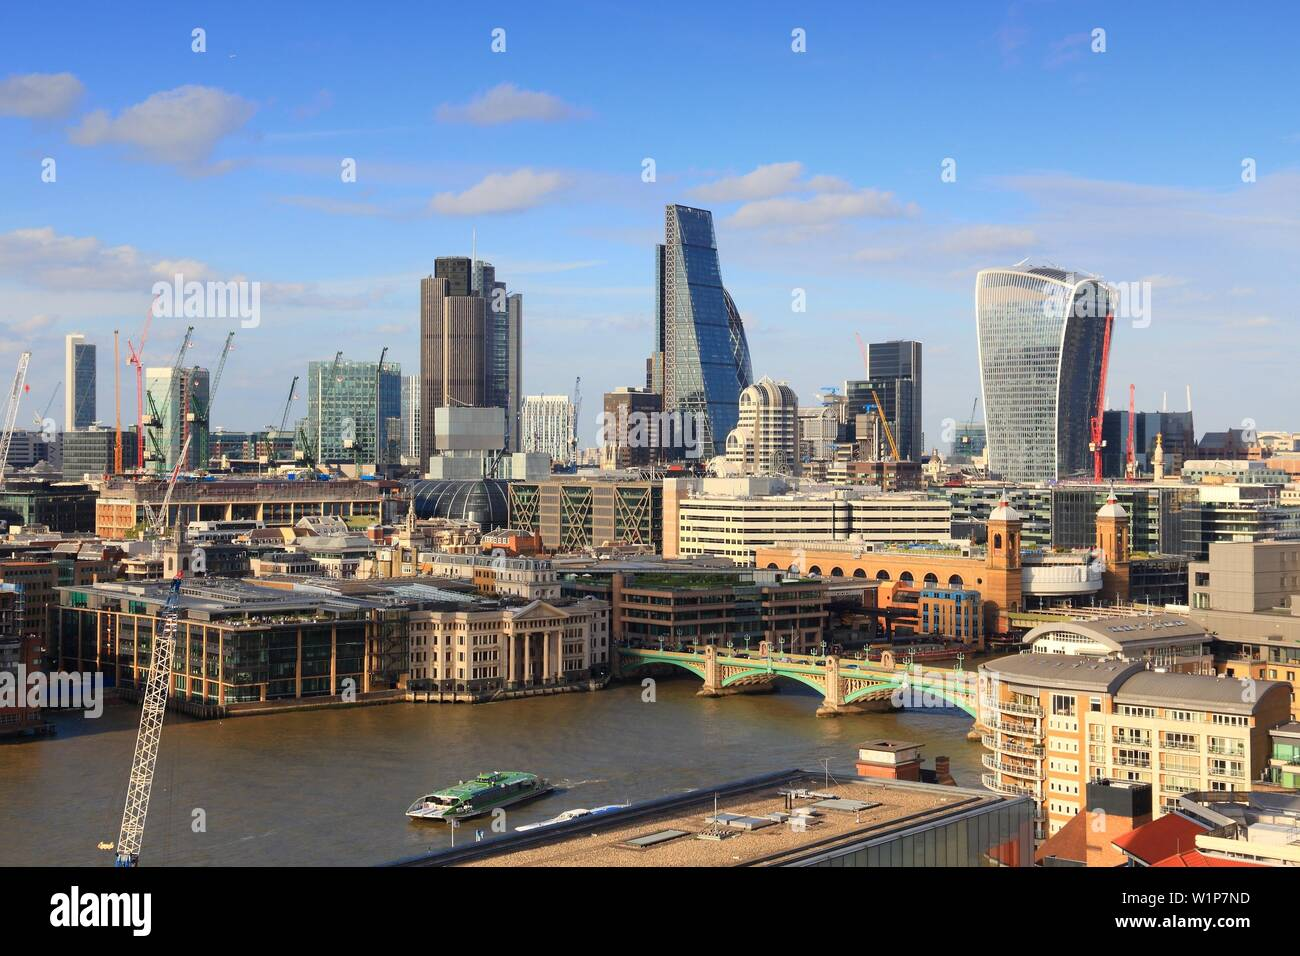 London UK skyline - Thames River and skyscraper city. - Stock Image